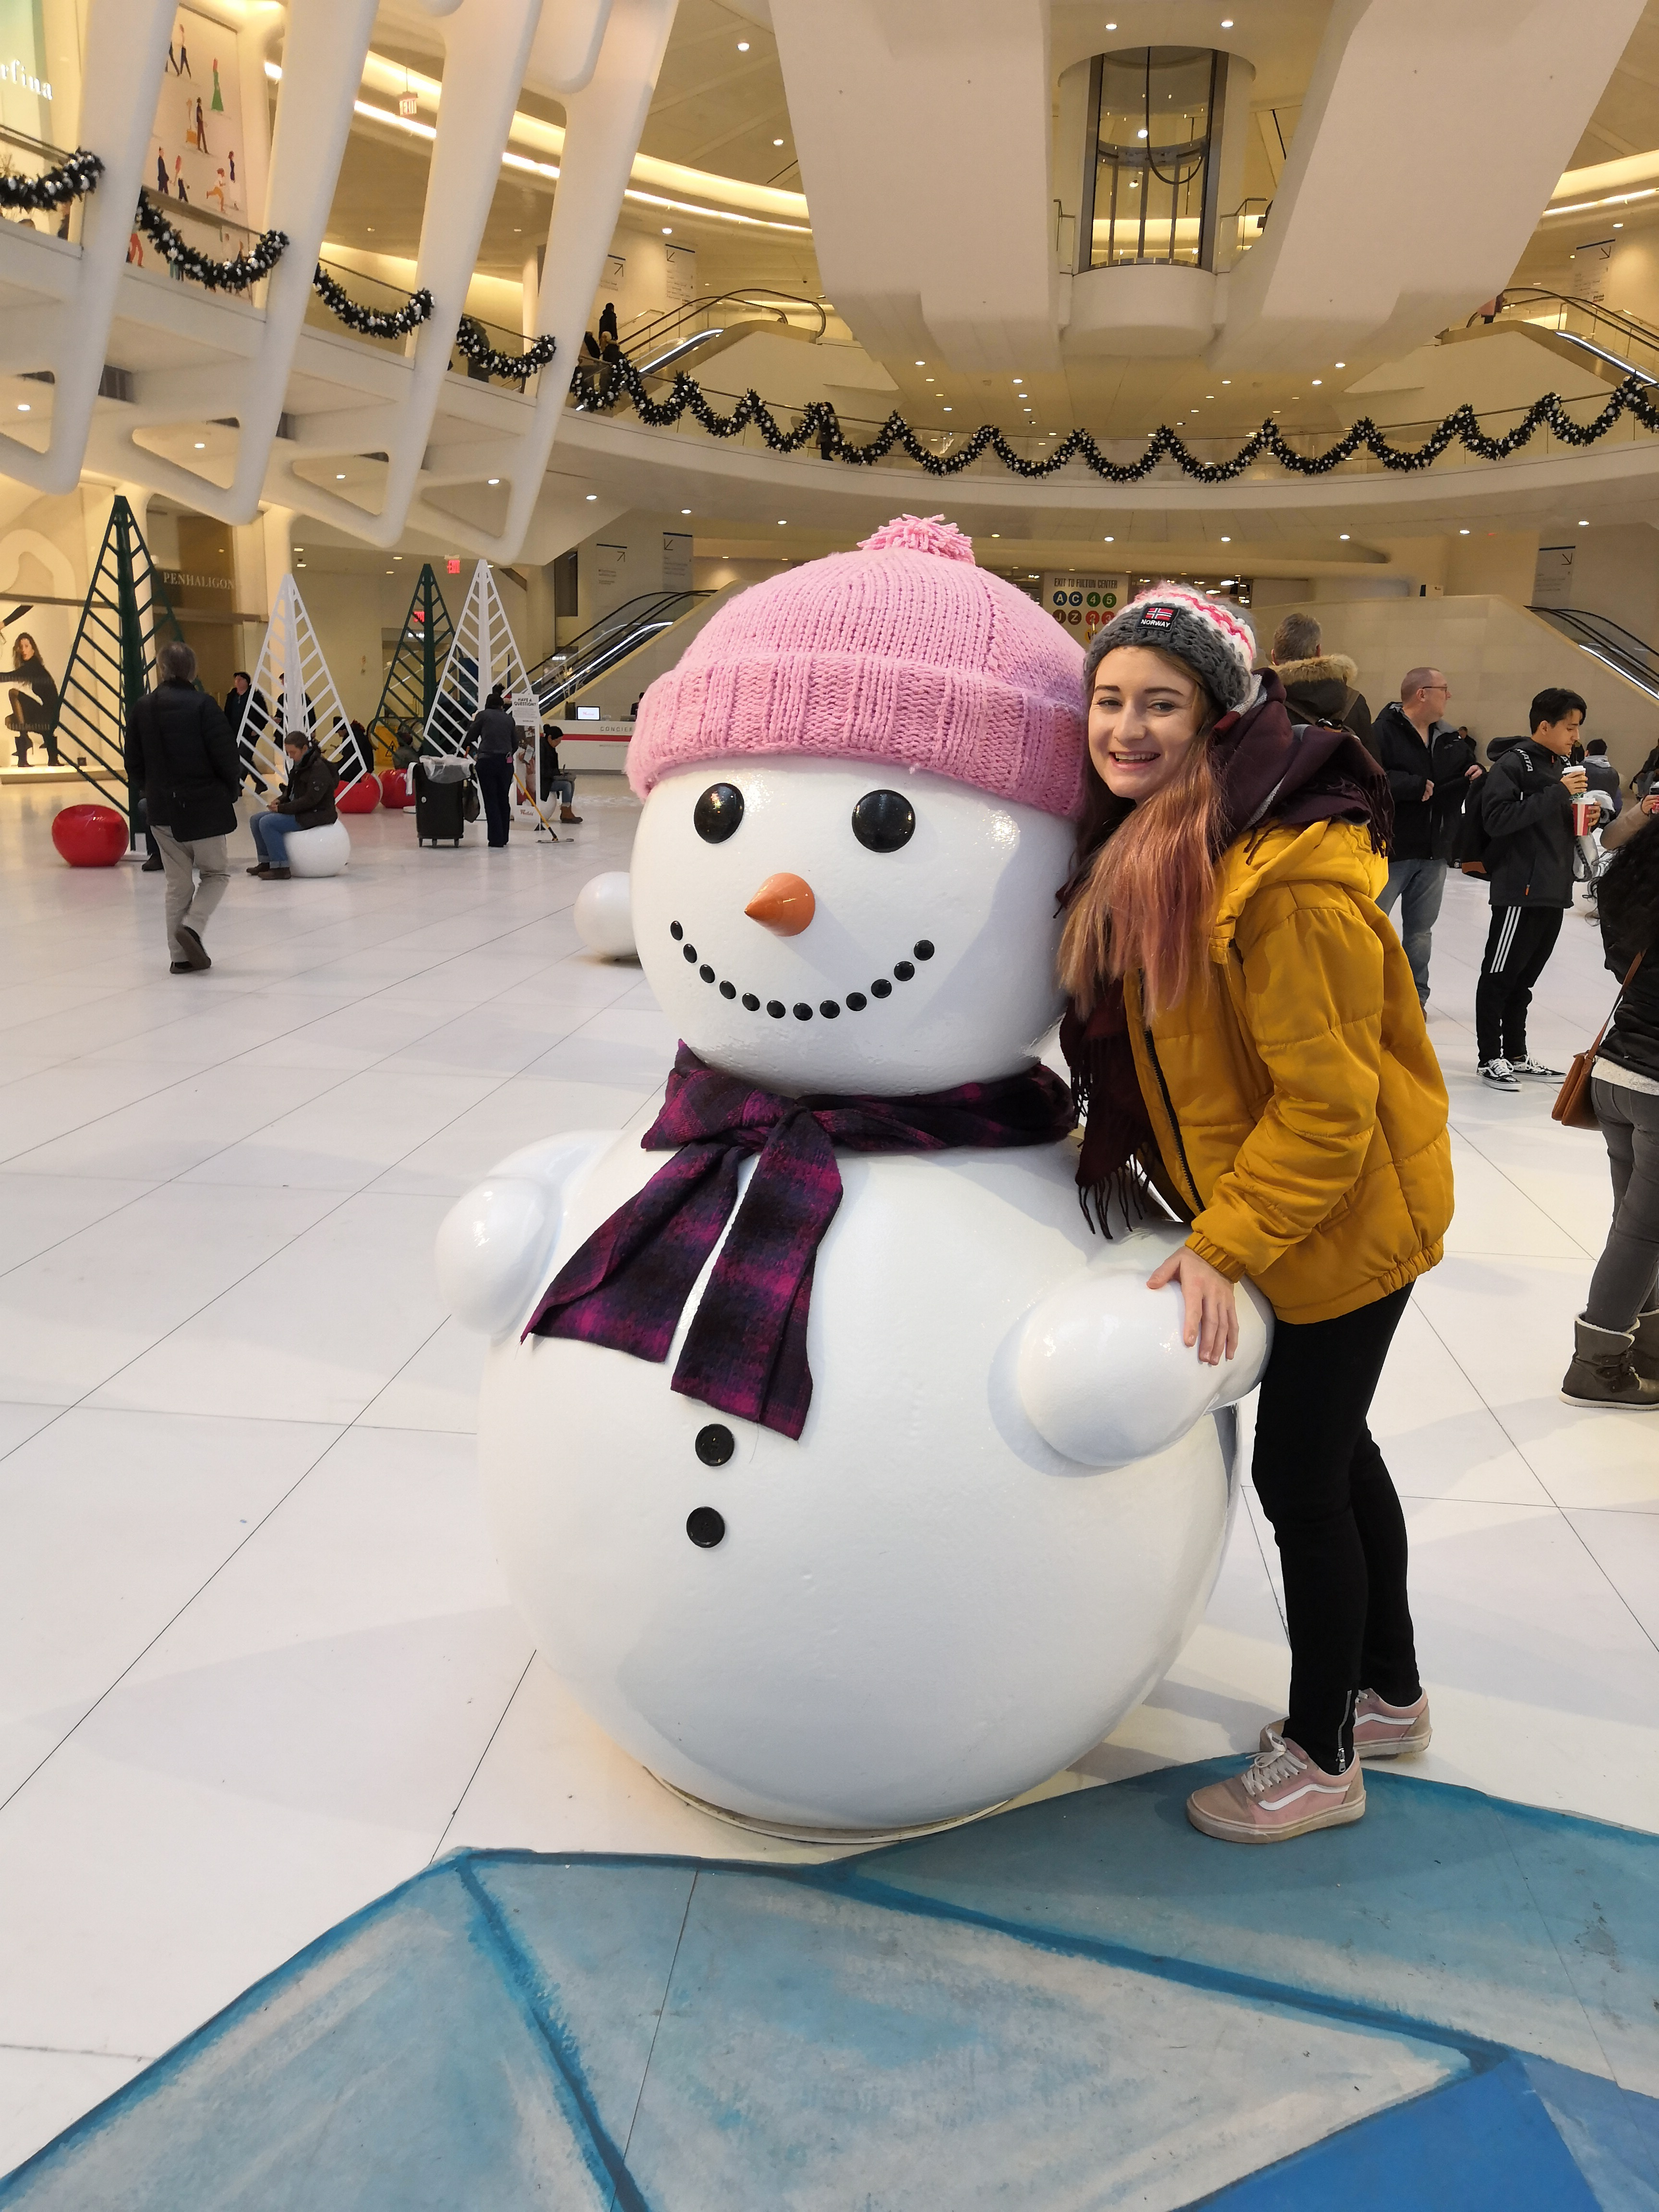 Snowman Juli